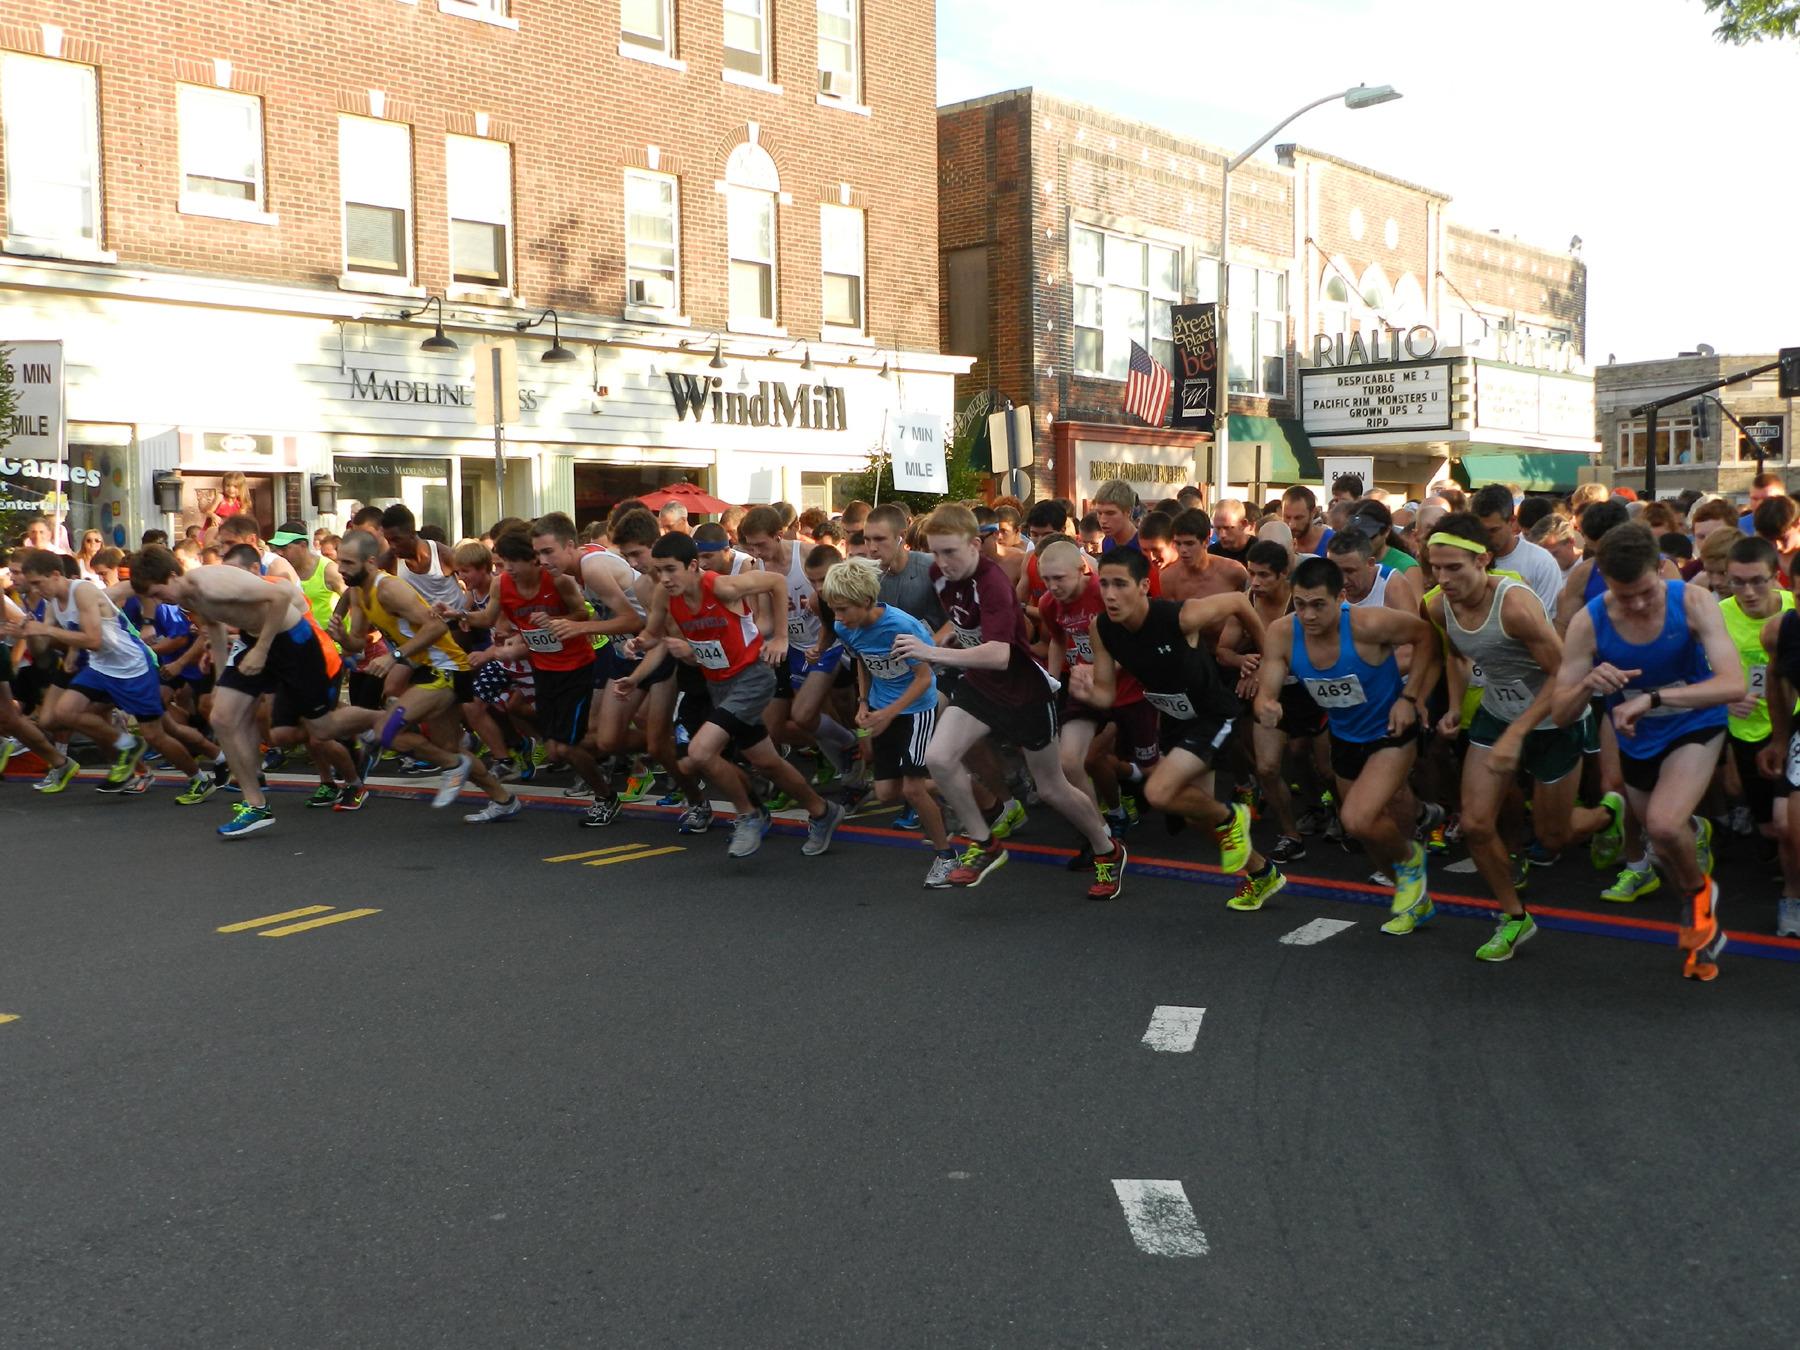 e0ab0adf208a58f81d40_2013_Pizza_Run_Race_Start.jpg